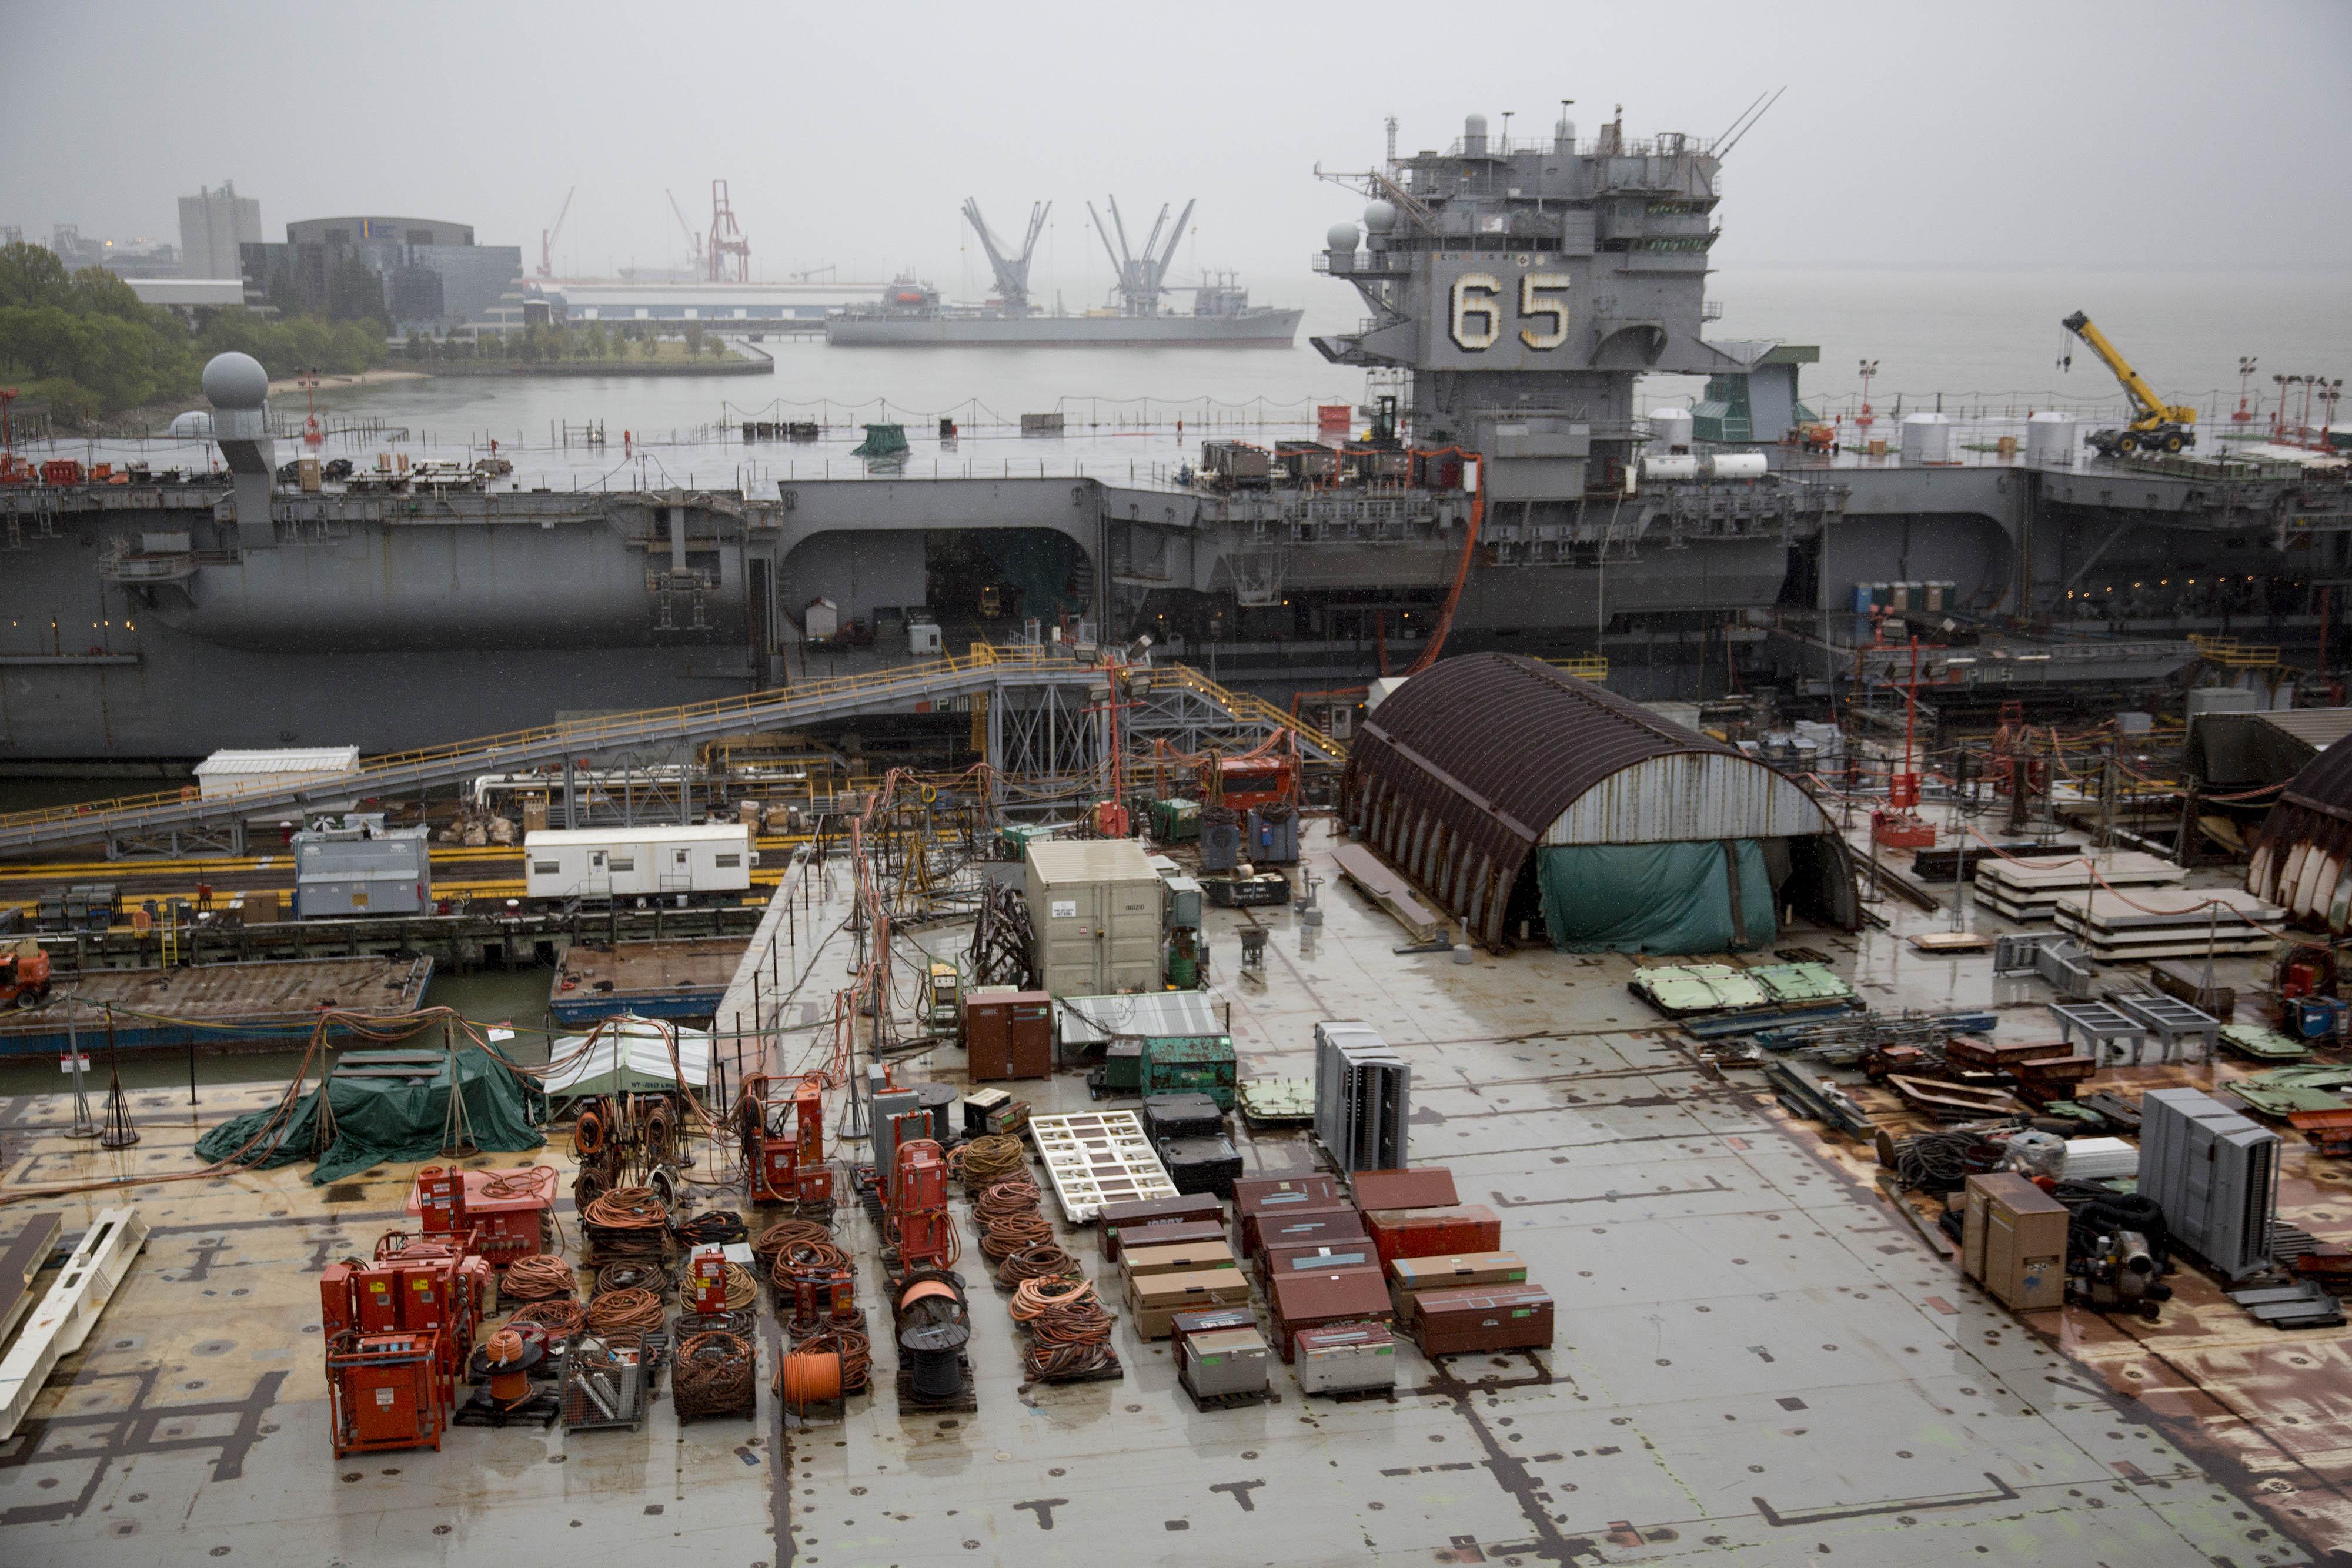 Operations At Newport News Shipbuilding Ahead Of Huntington Ingalls Earnings